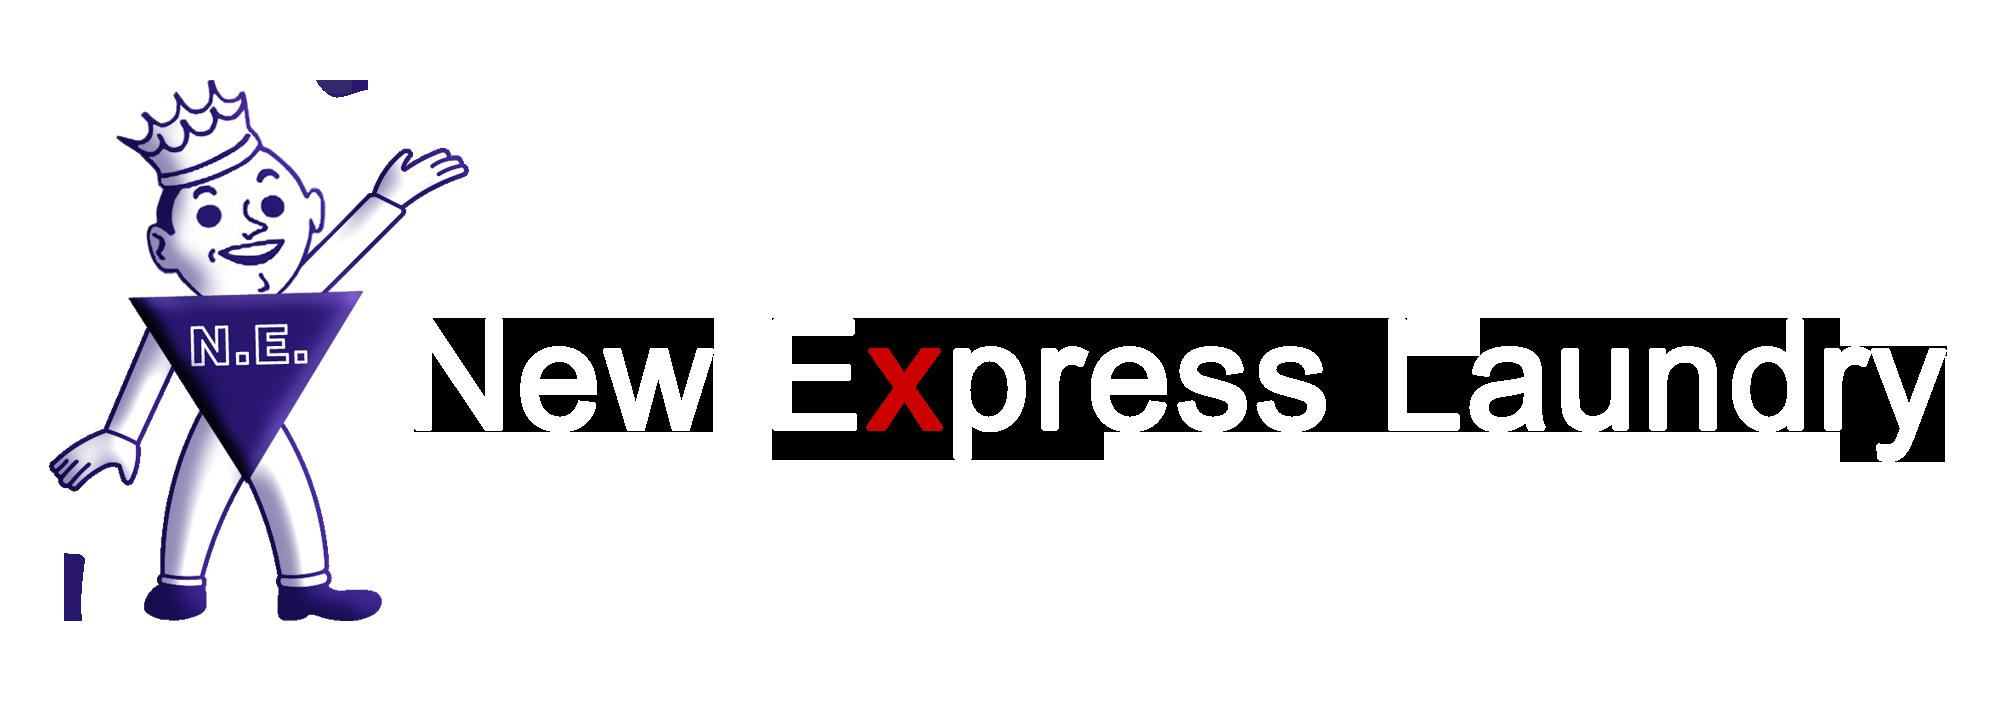 New Express Laundry